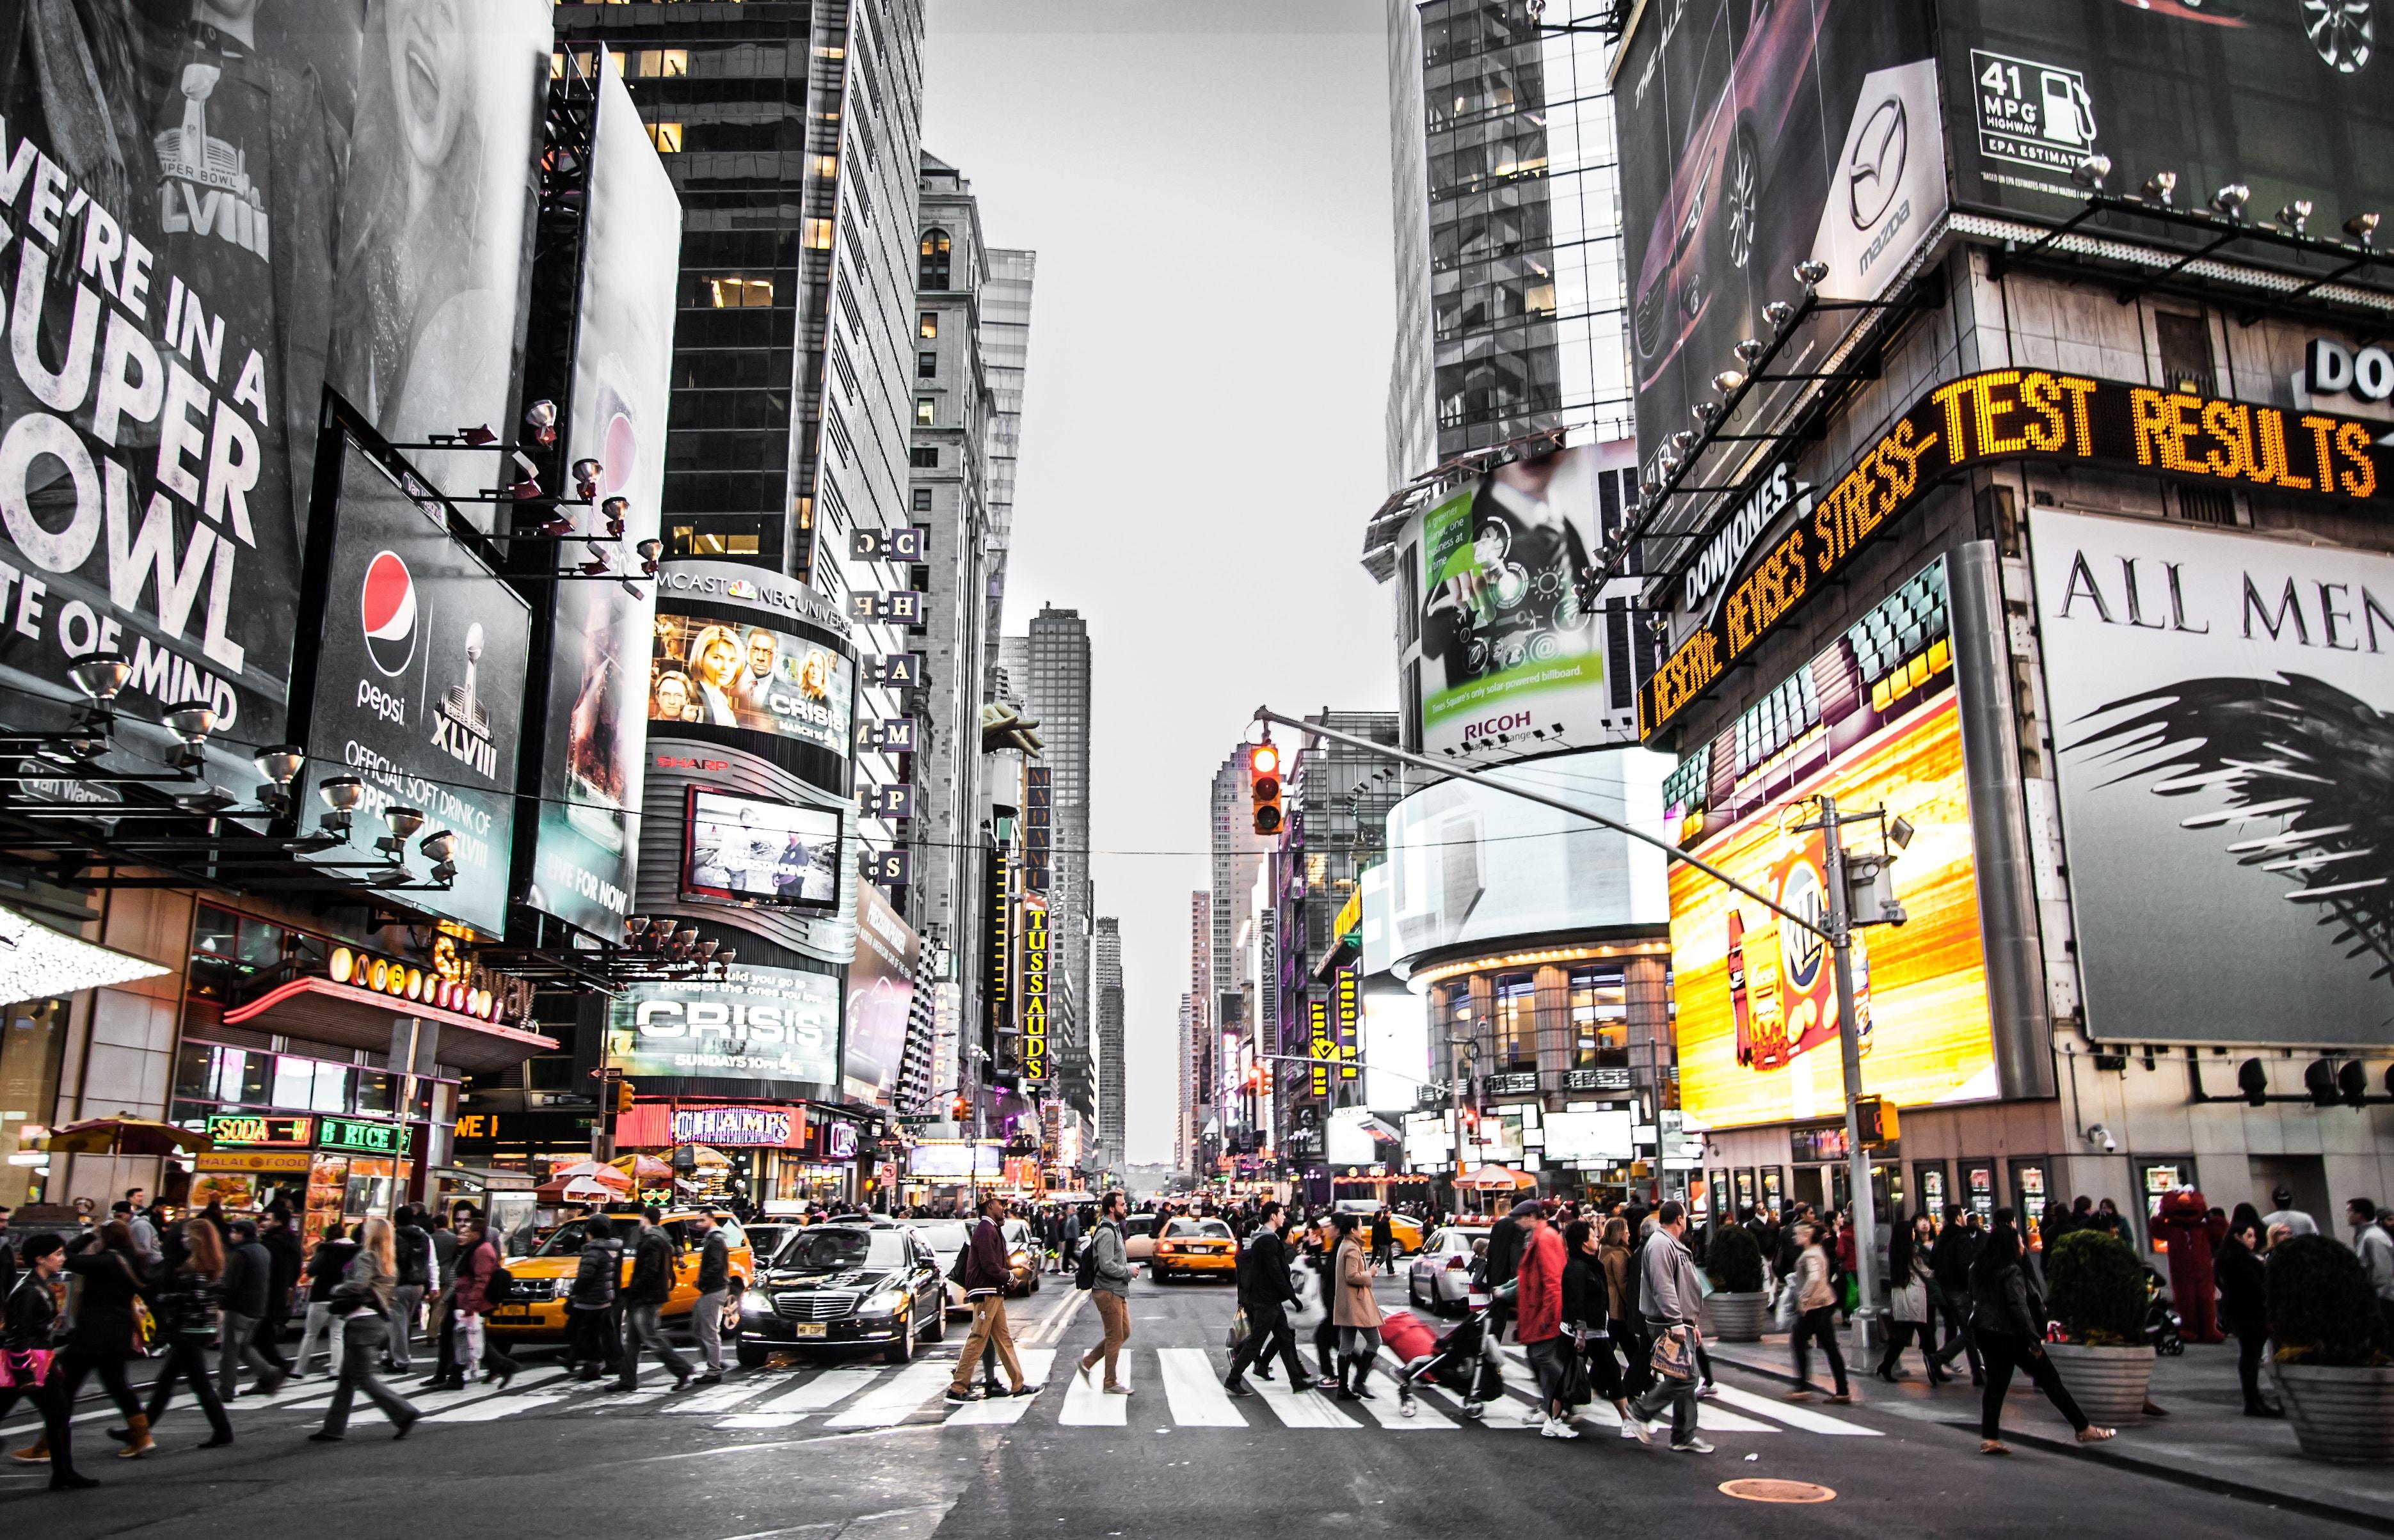 Unlocking people premium in the world of new media